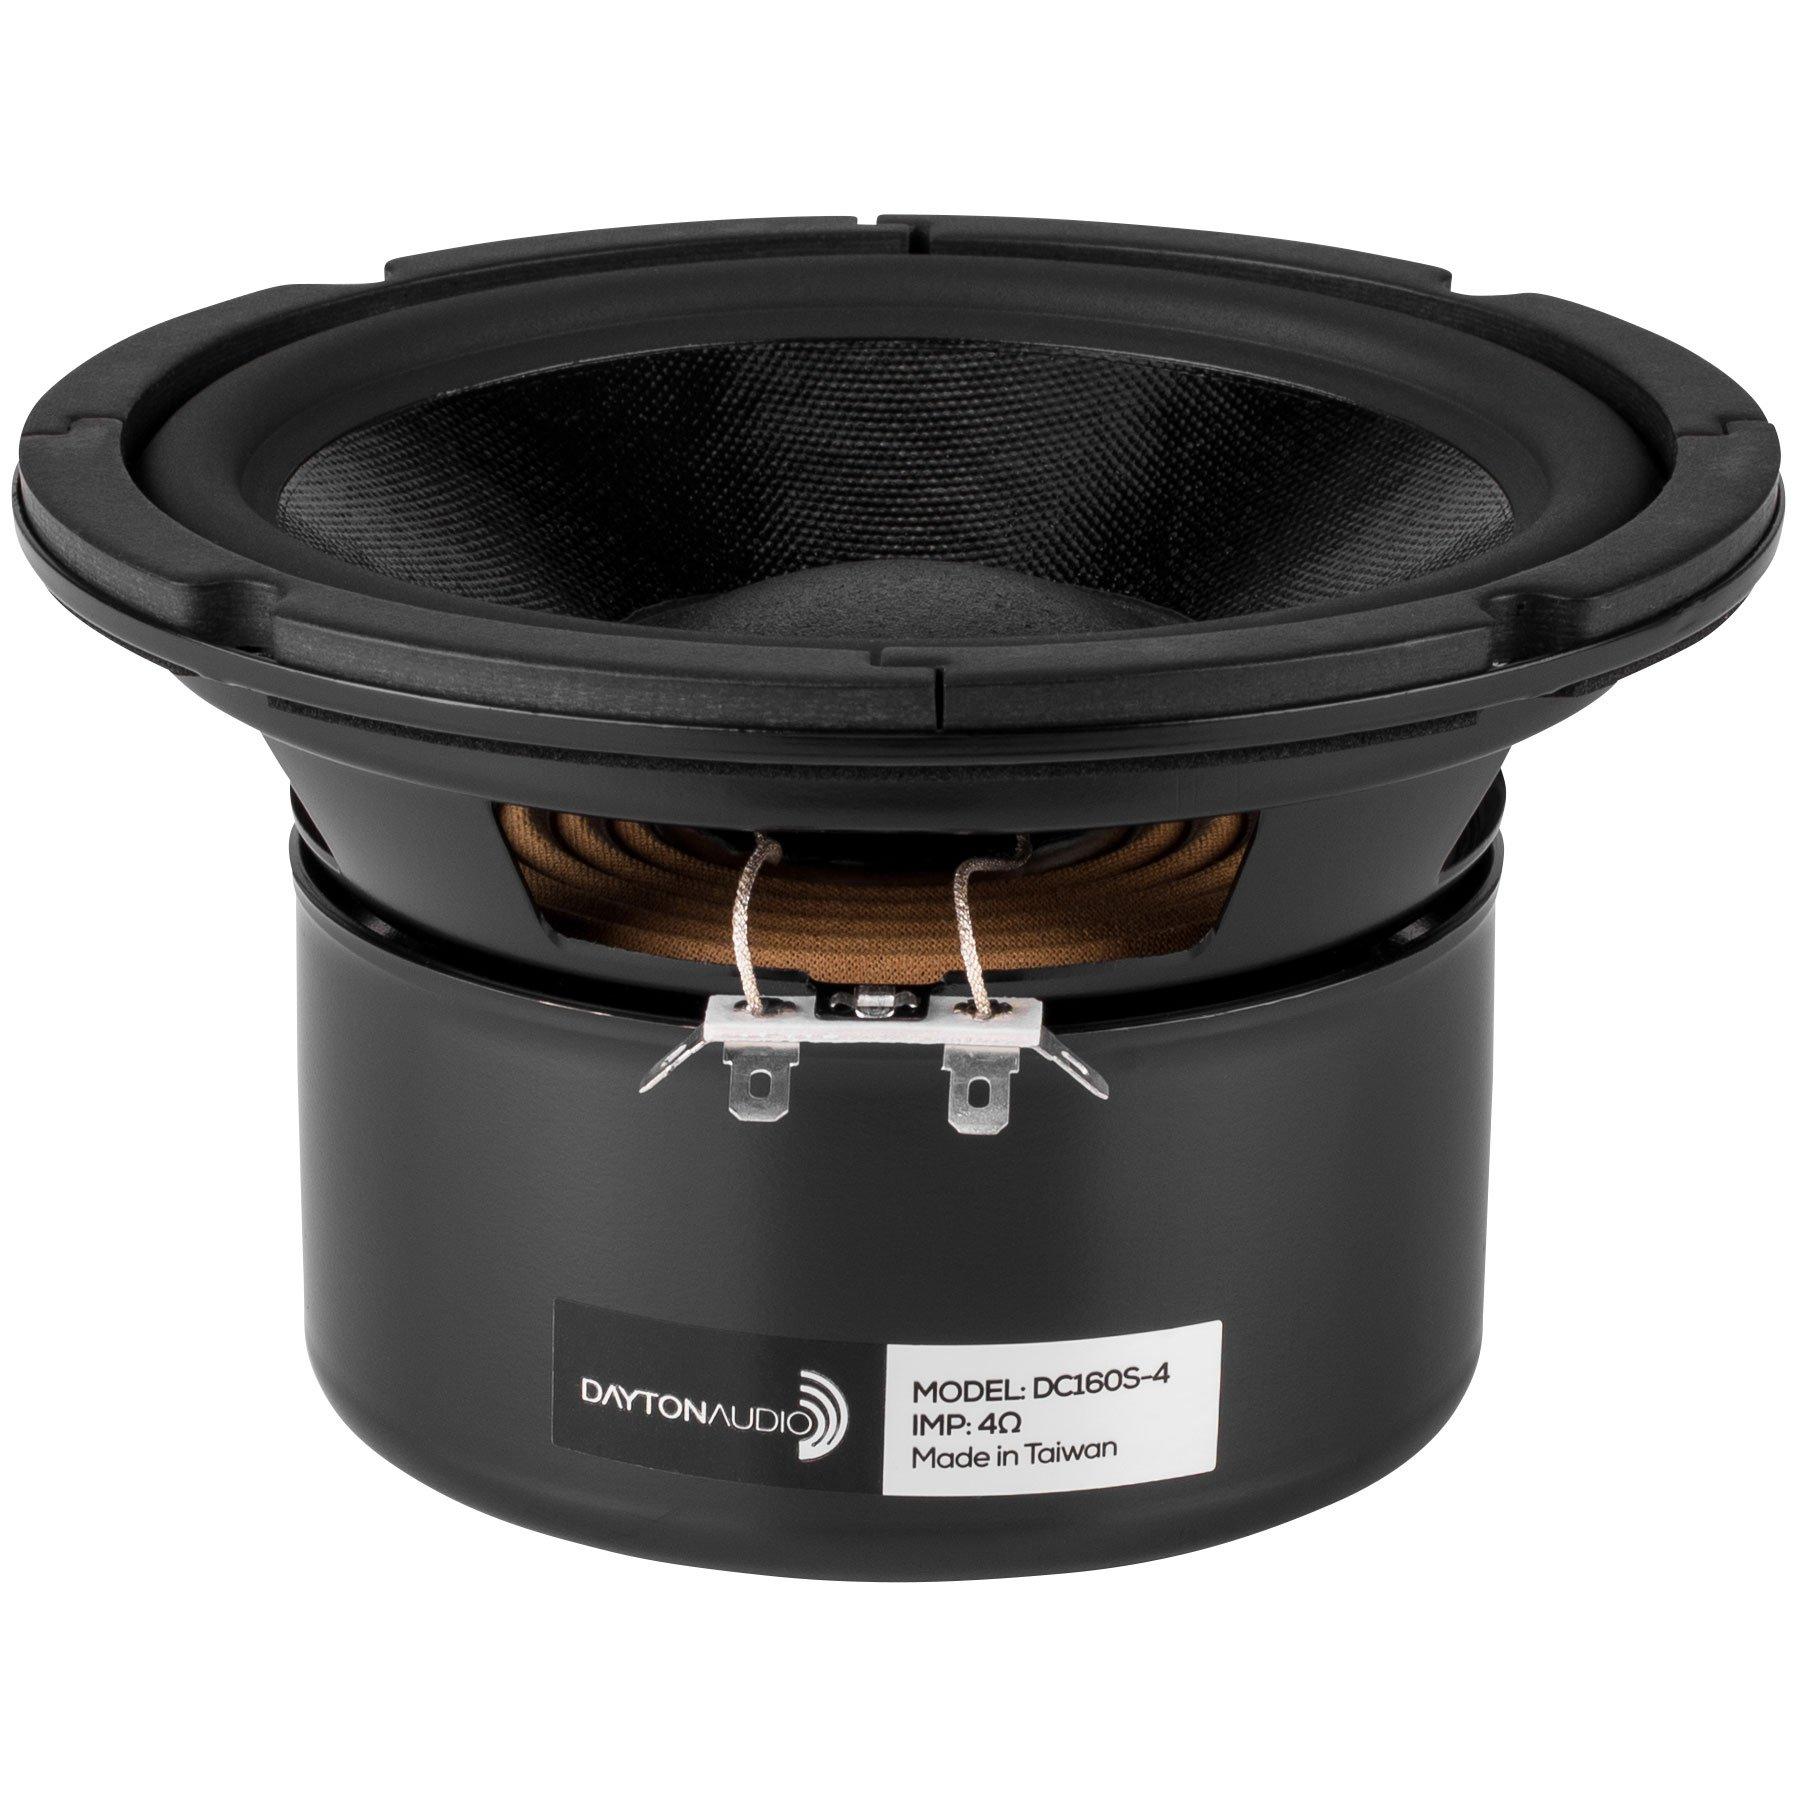 Dayton Audio DC160S-4 6-1/2 Classic Shielded Woofer 4 Ohm